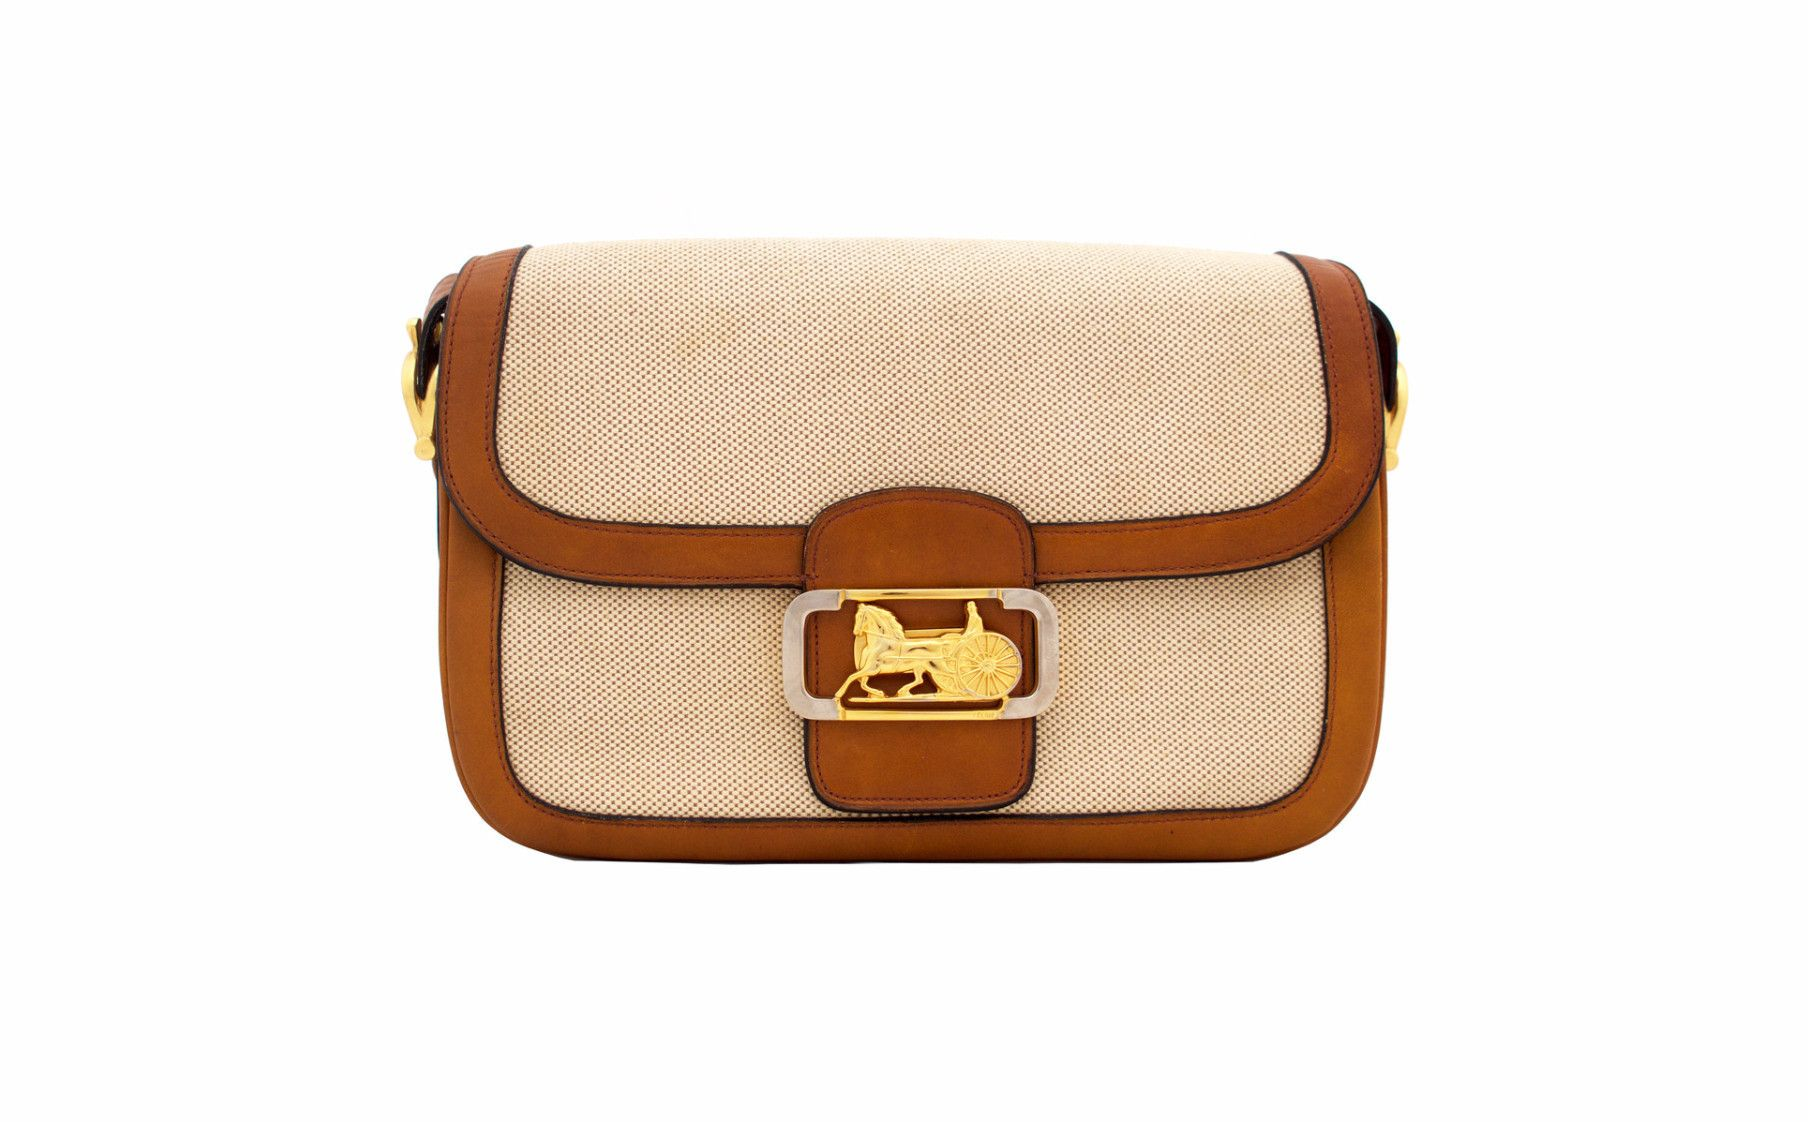 CELINE VINTAGE BAG - Classic Box in Brown Canvas from Vintage District d758ff336d27c